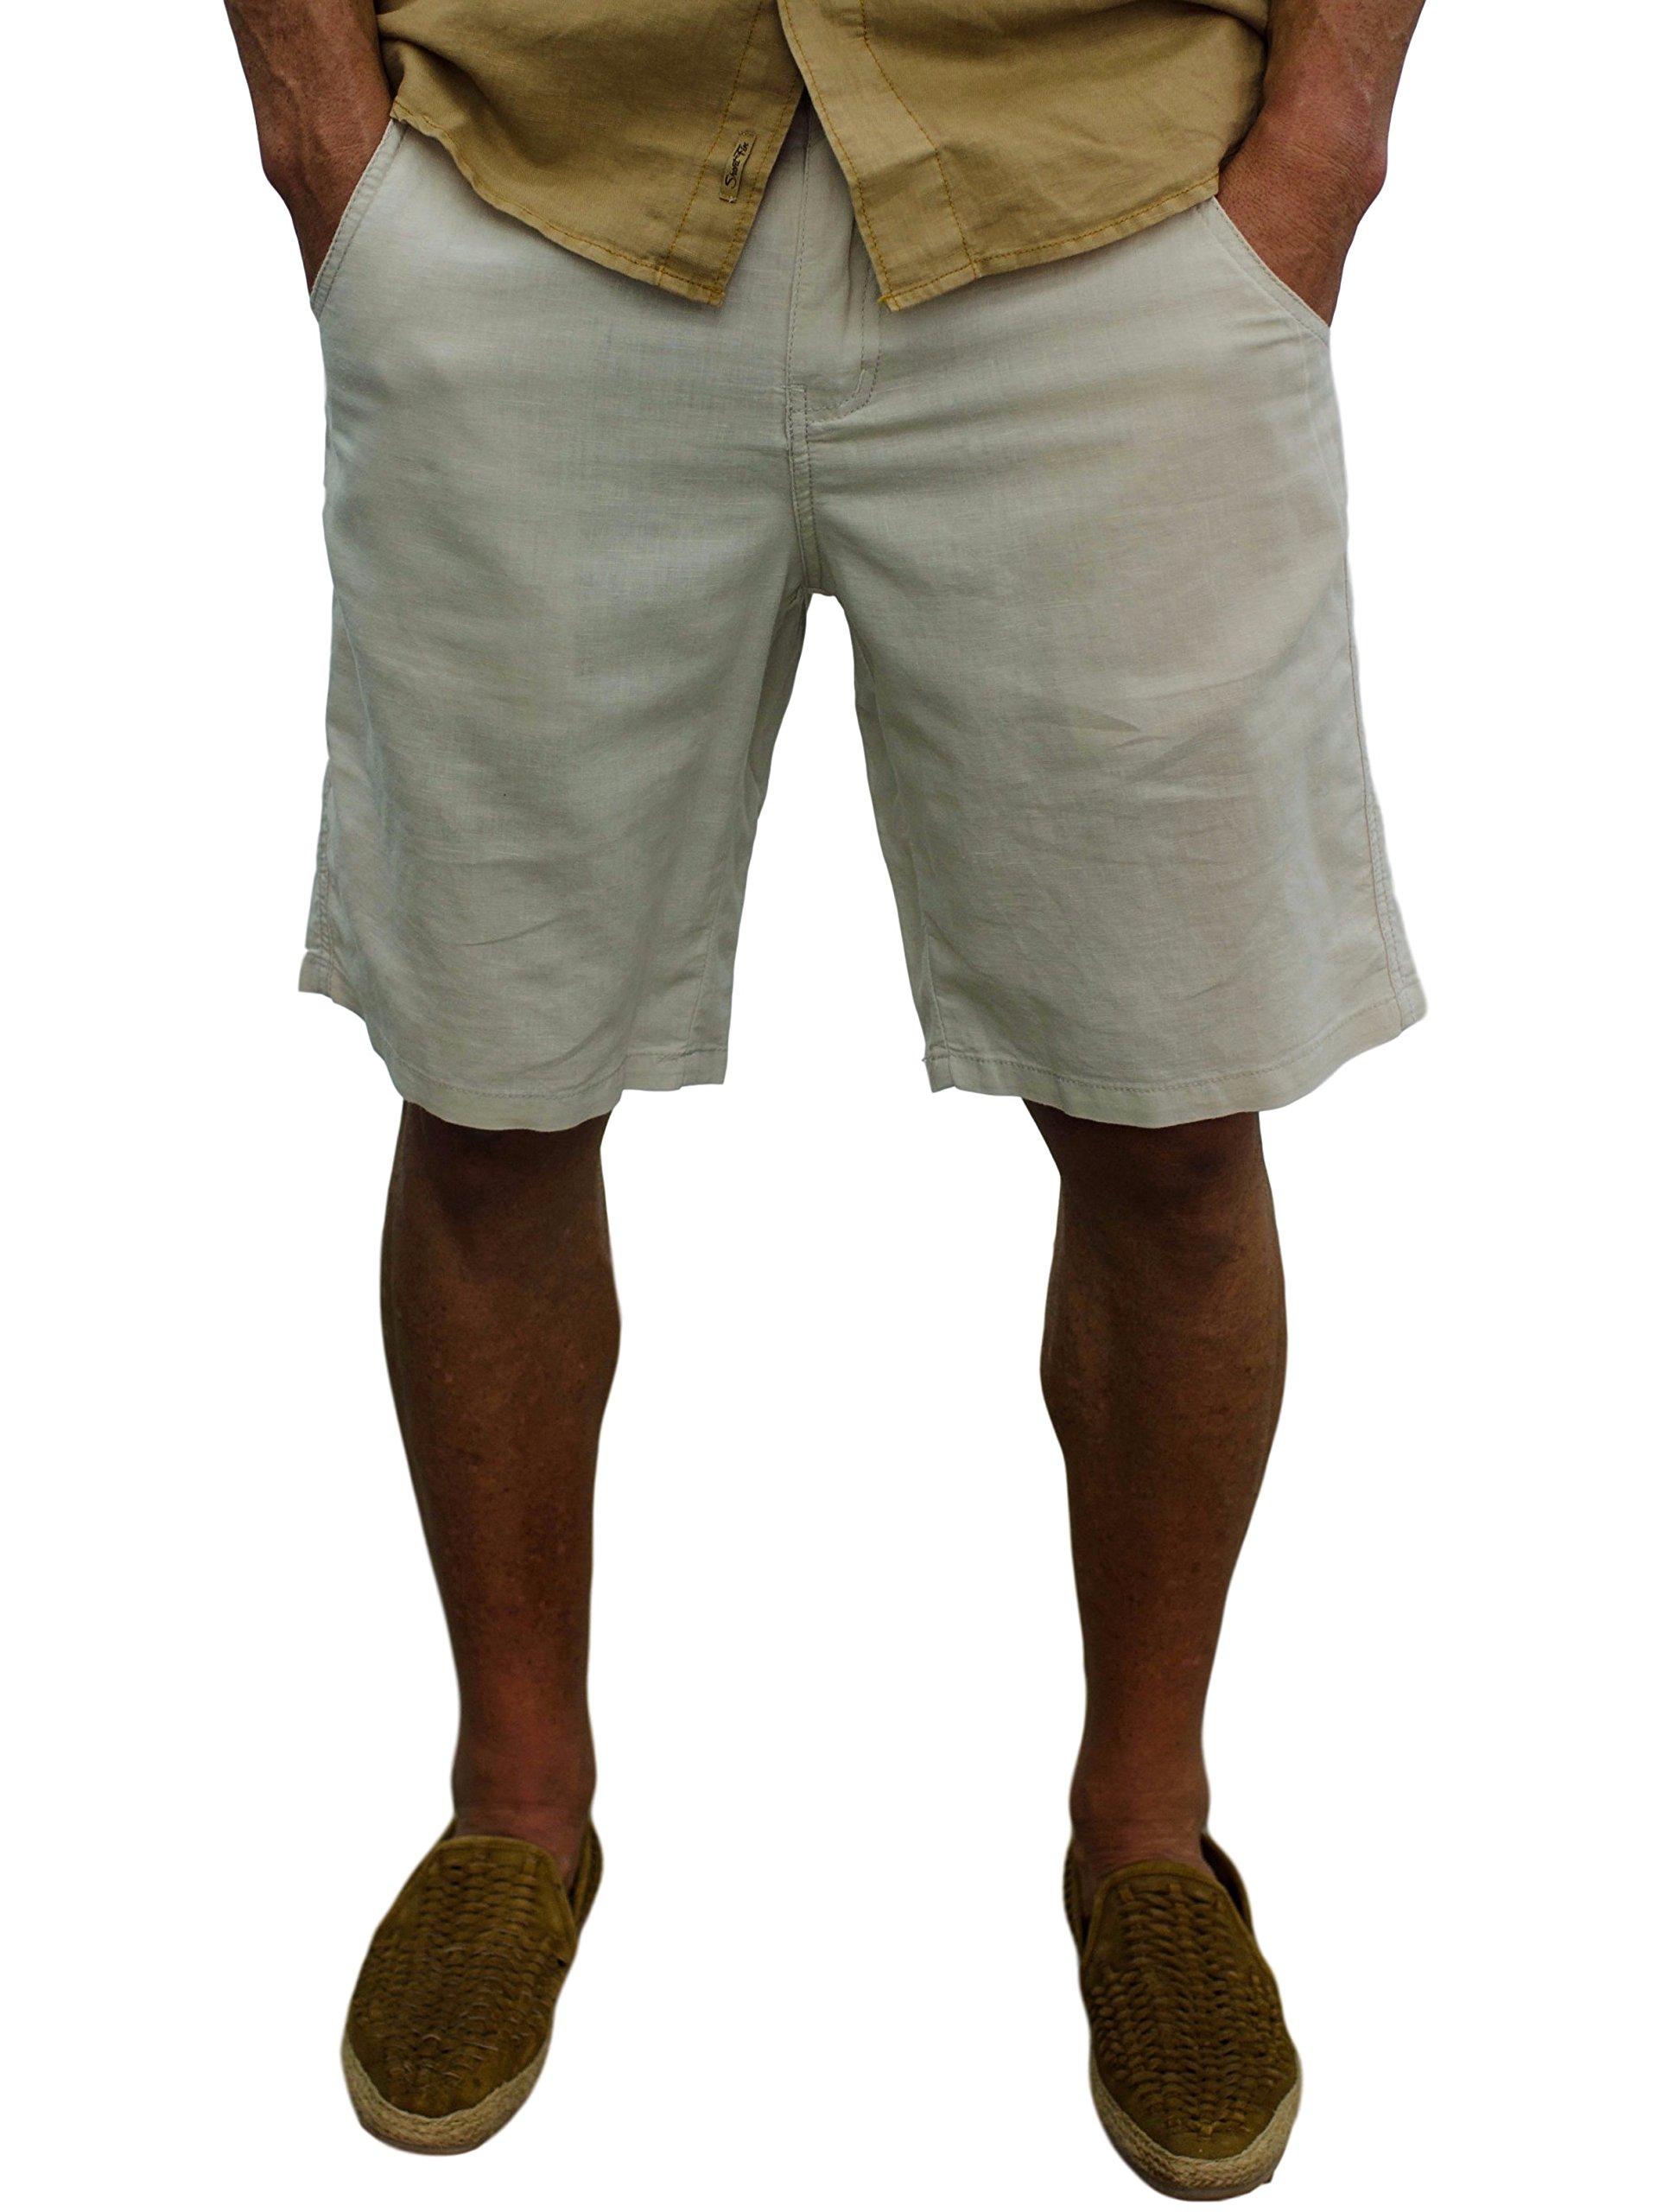 Short Fin Linen Walking Shorts (Size 34, Stone L8000)